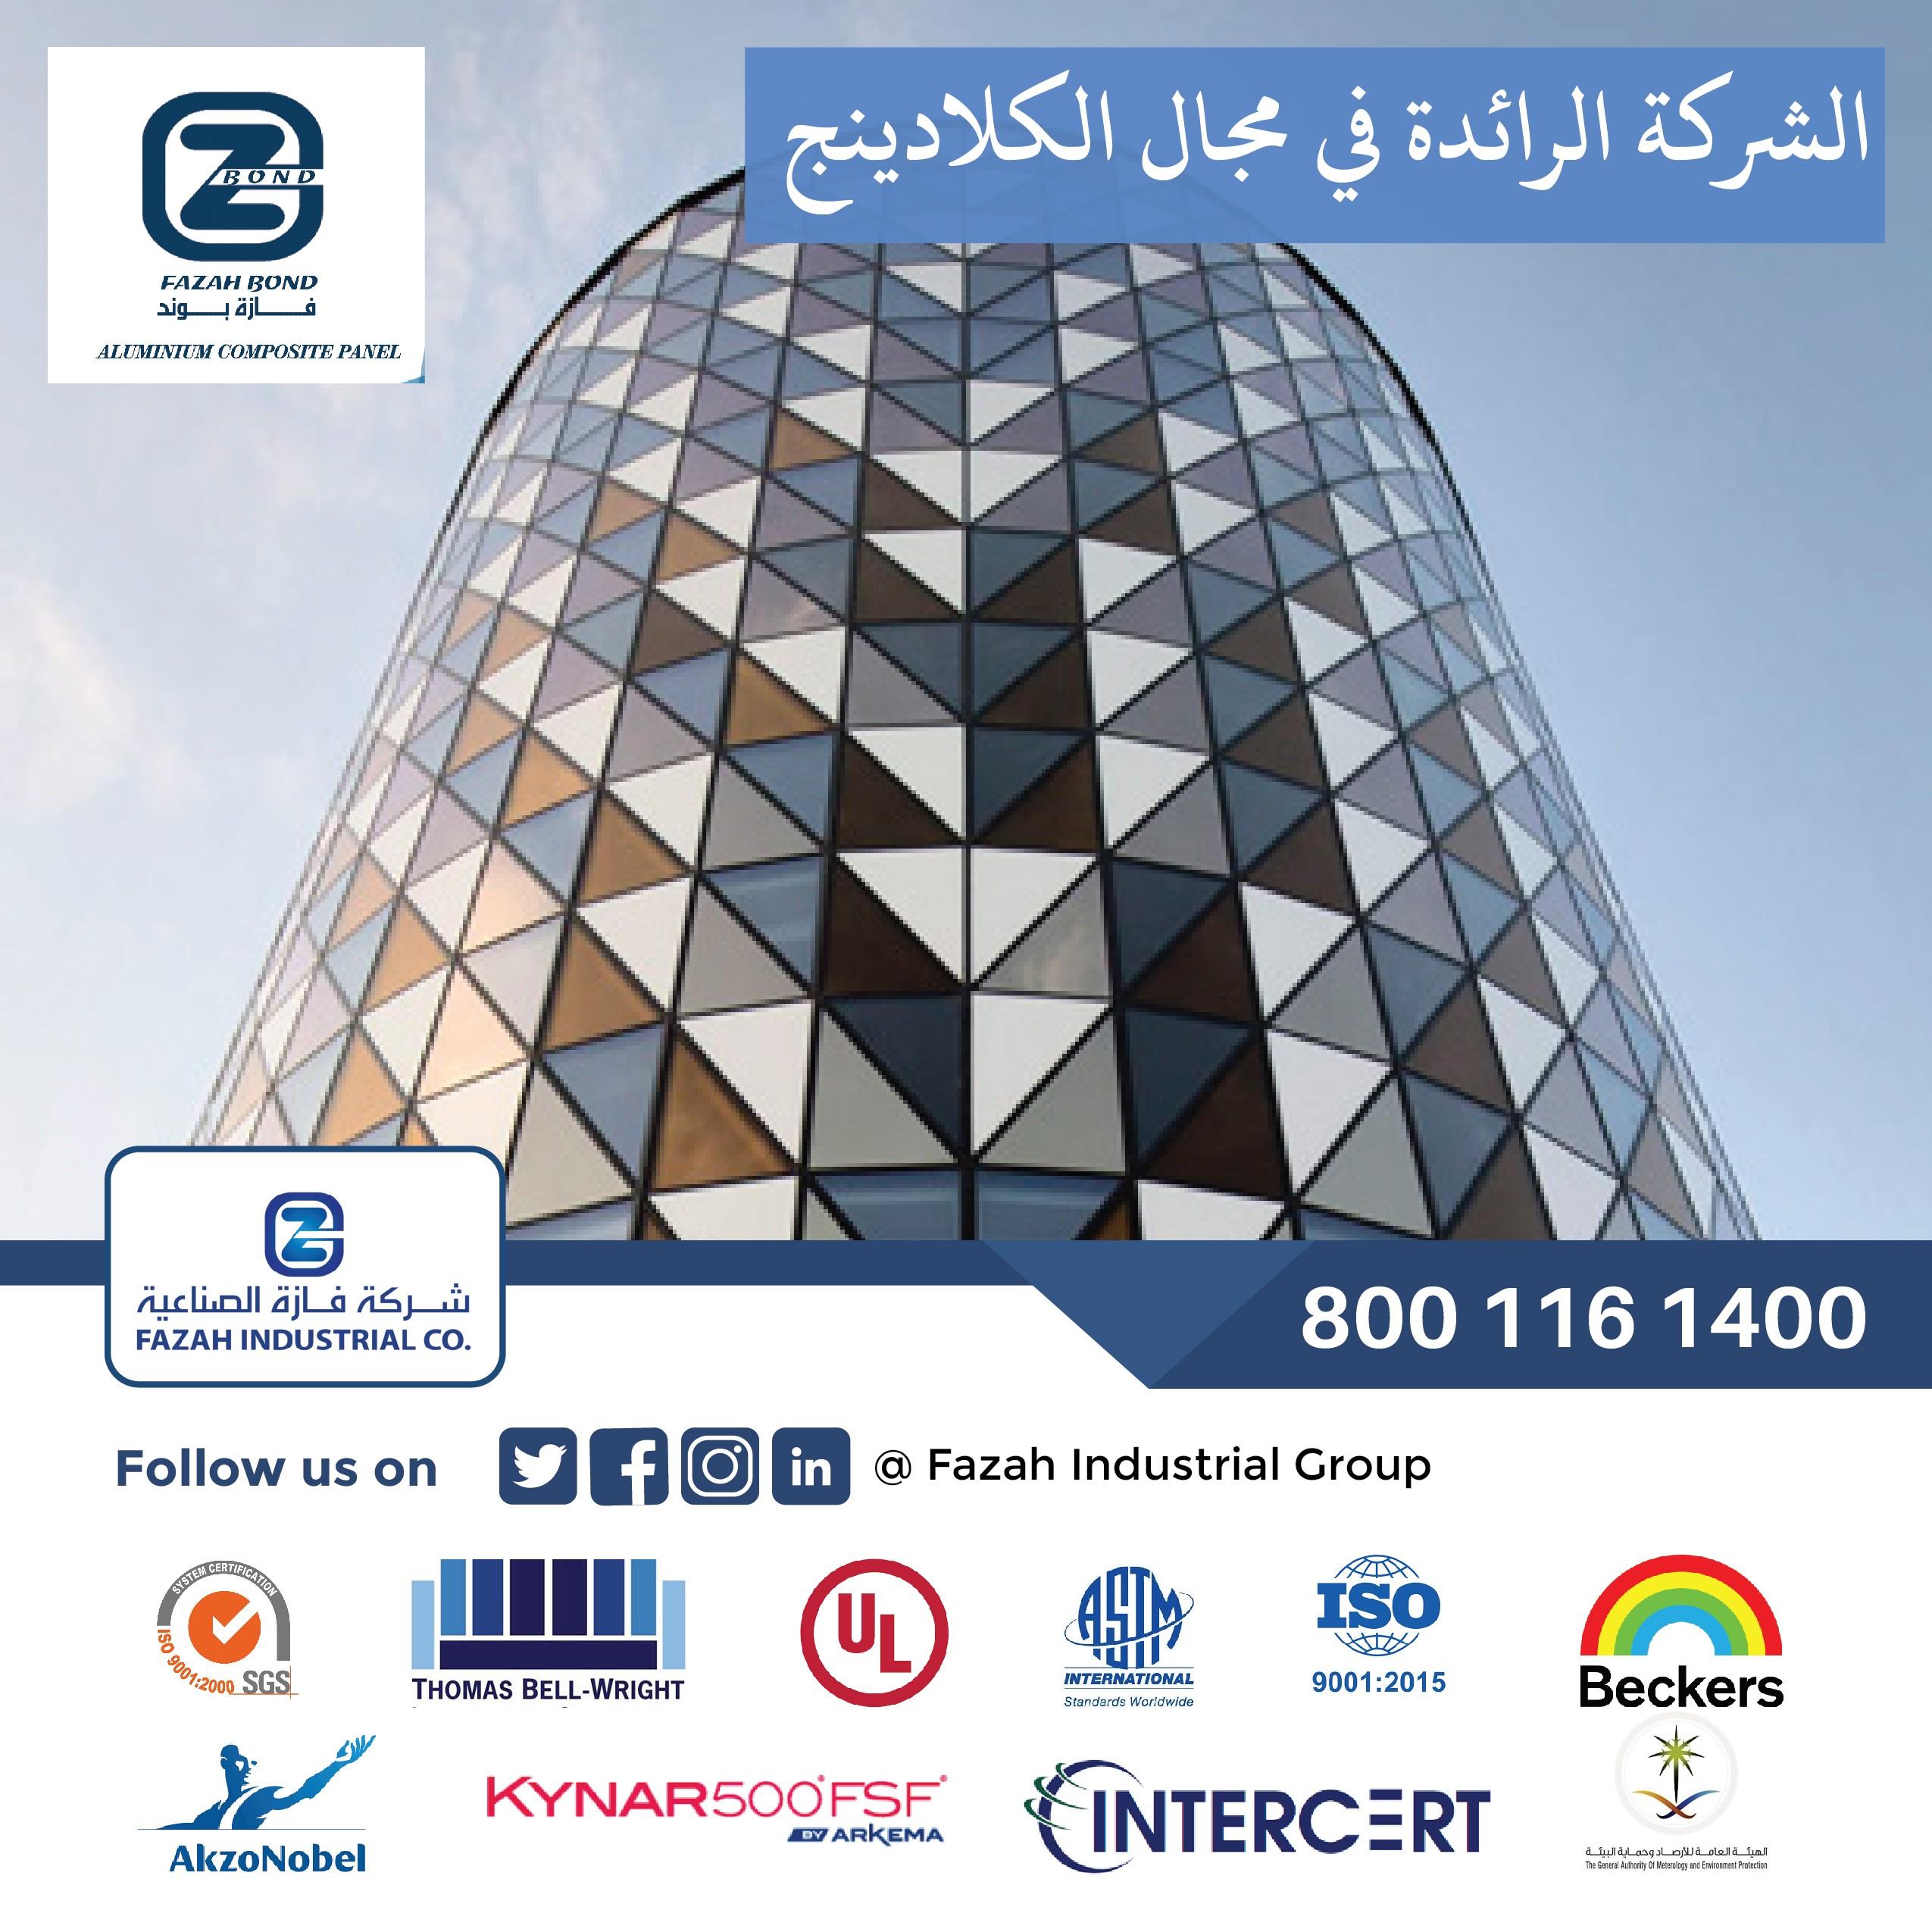 FAZAH Industrial Group | LinkedIn